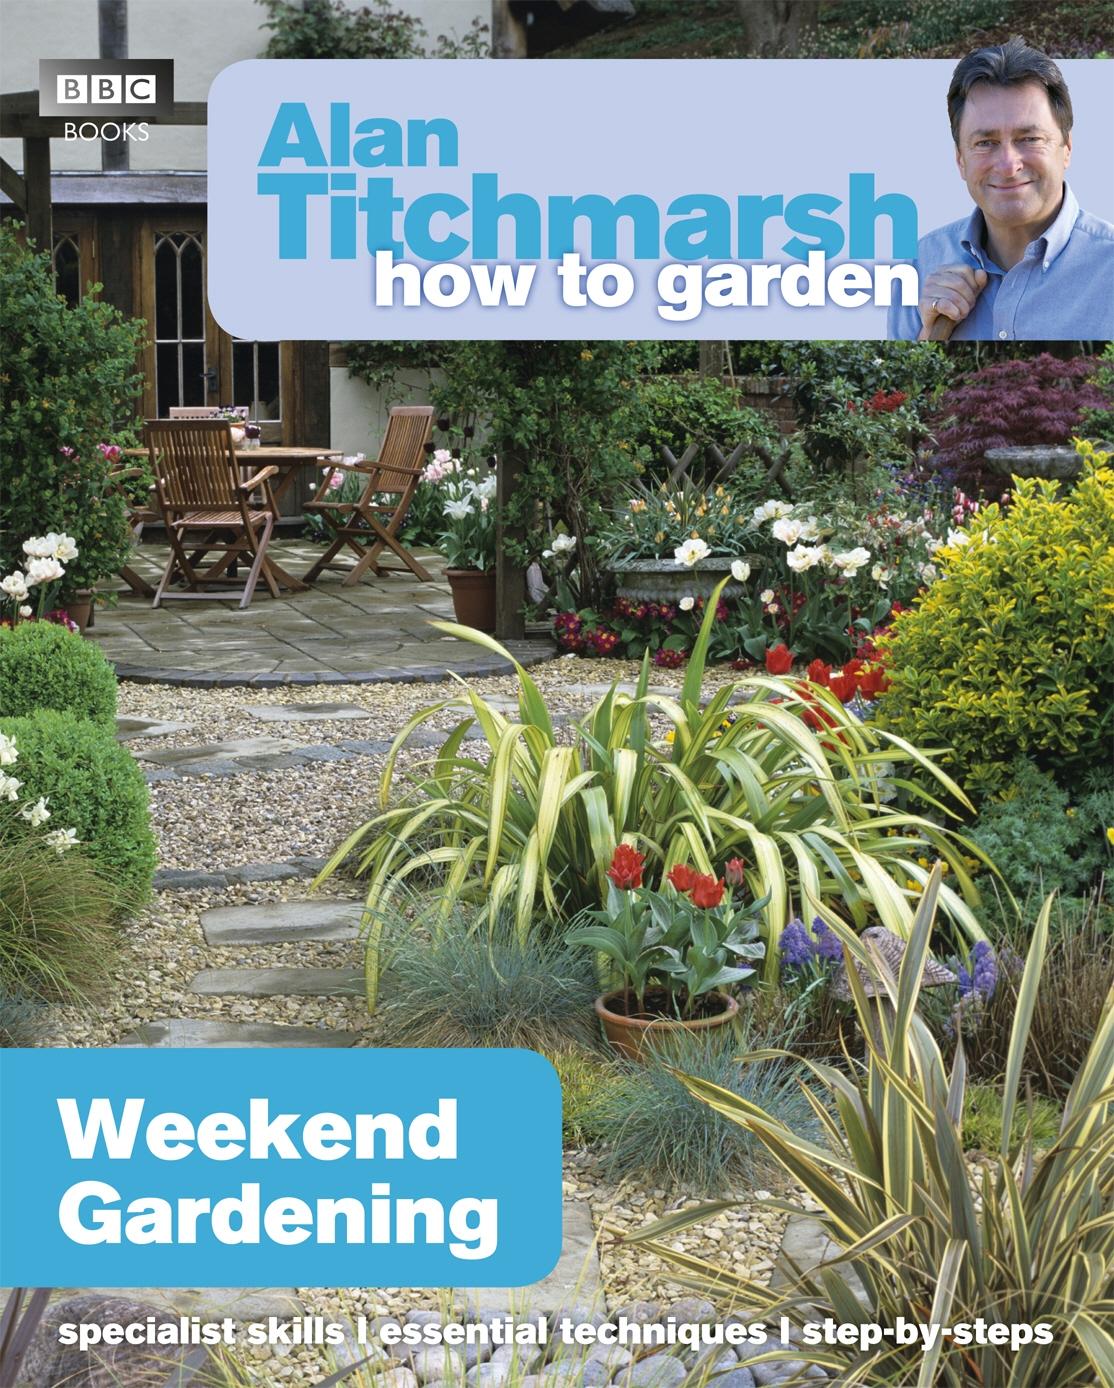 Alan Titchmarsh How to Garden Weekend Gardening by Alan Titchmarsh